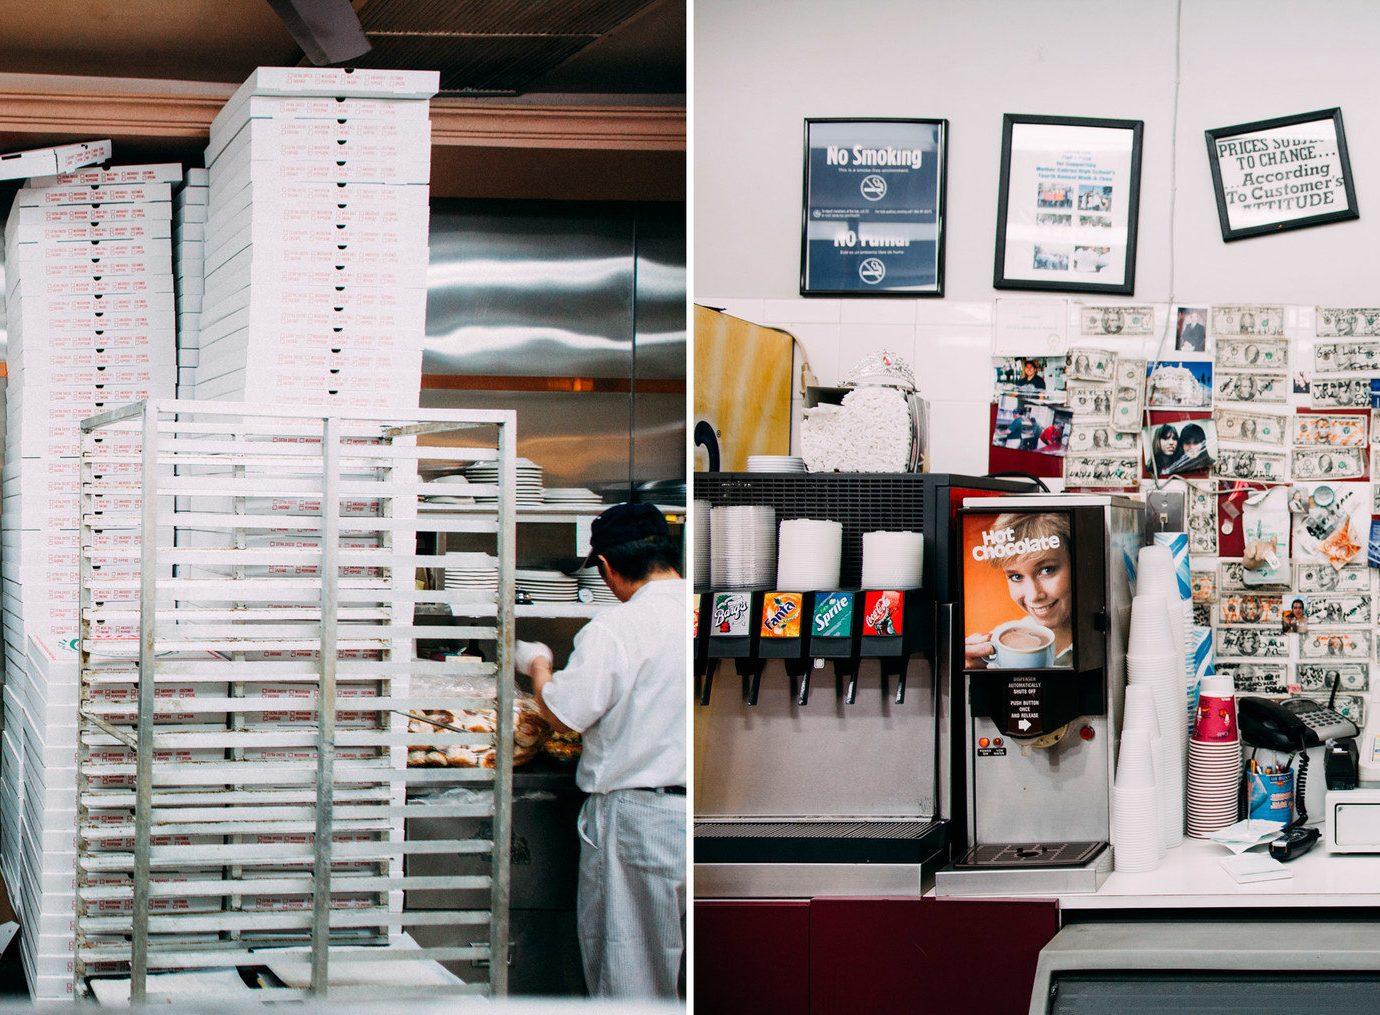 Food + Drink indoor room Boutique interior design retail Design cluttered